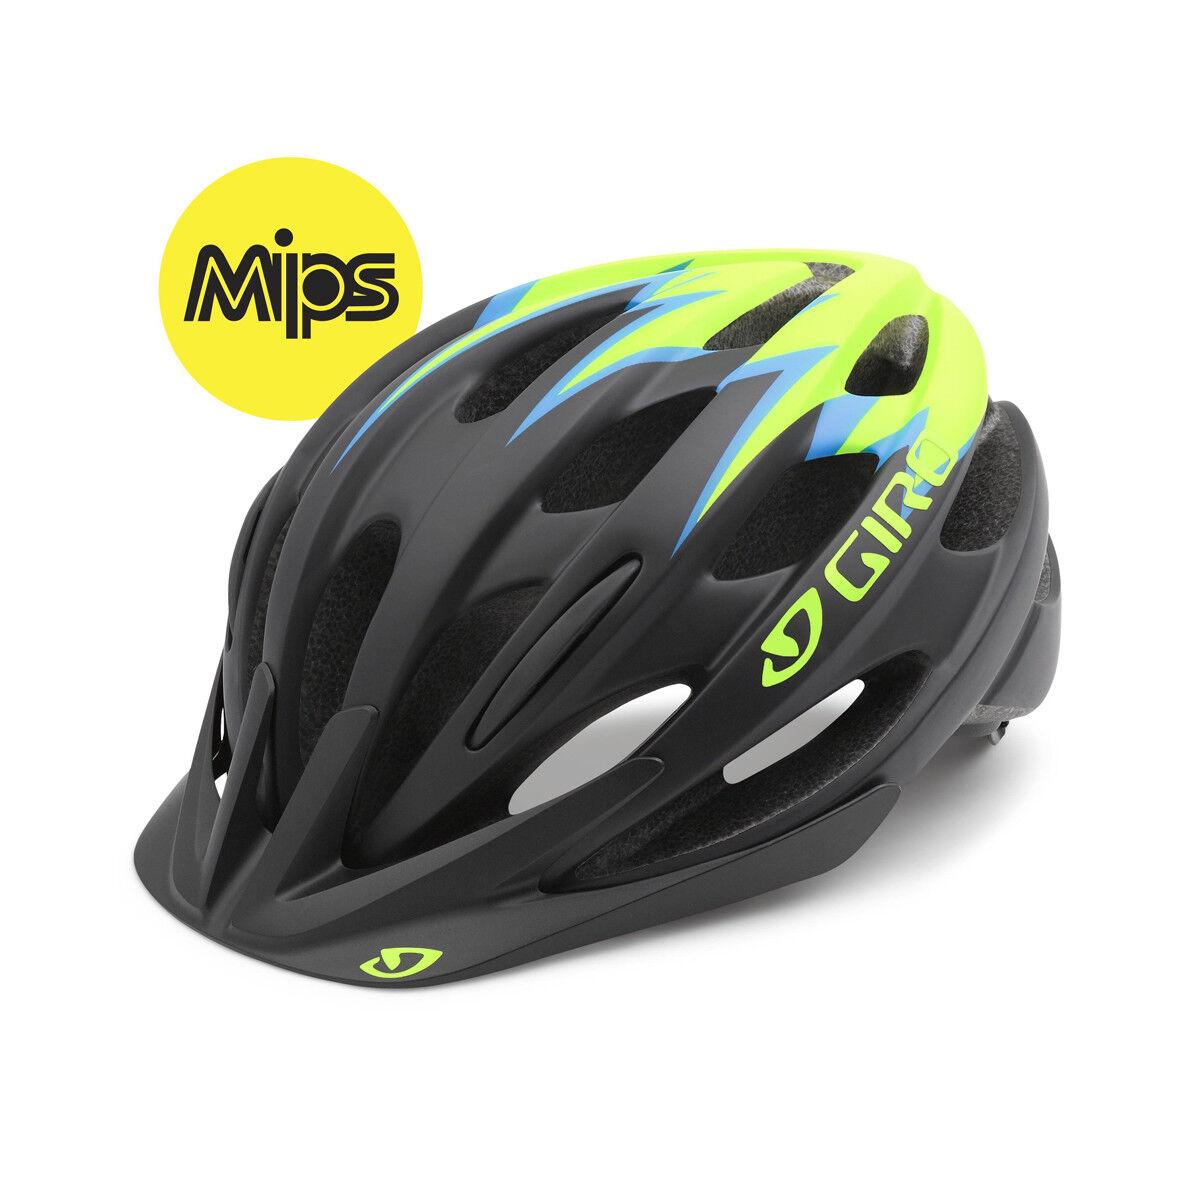 Giro Raze MIPS Jugend Fahrrad Helm Gr. 50-57cm 50-57cm 50-57cm schwarz grün 2016 c3c693